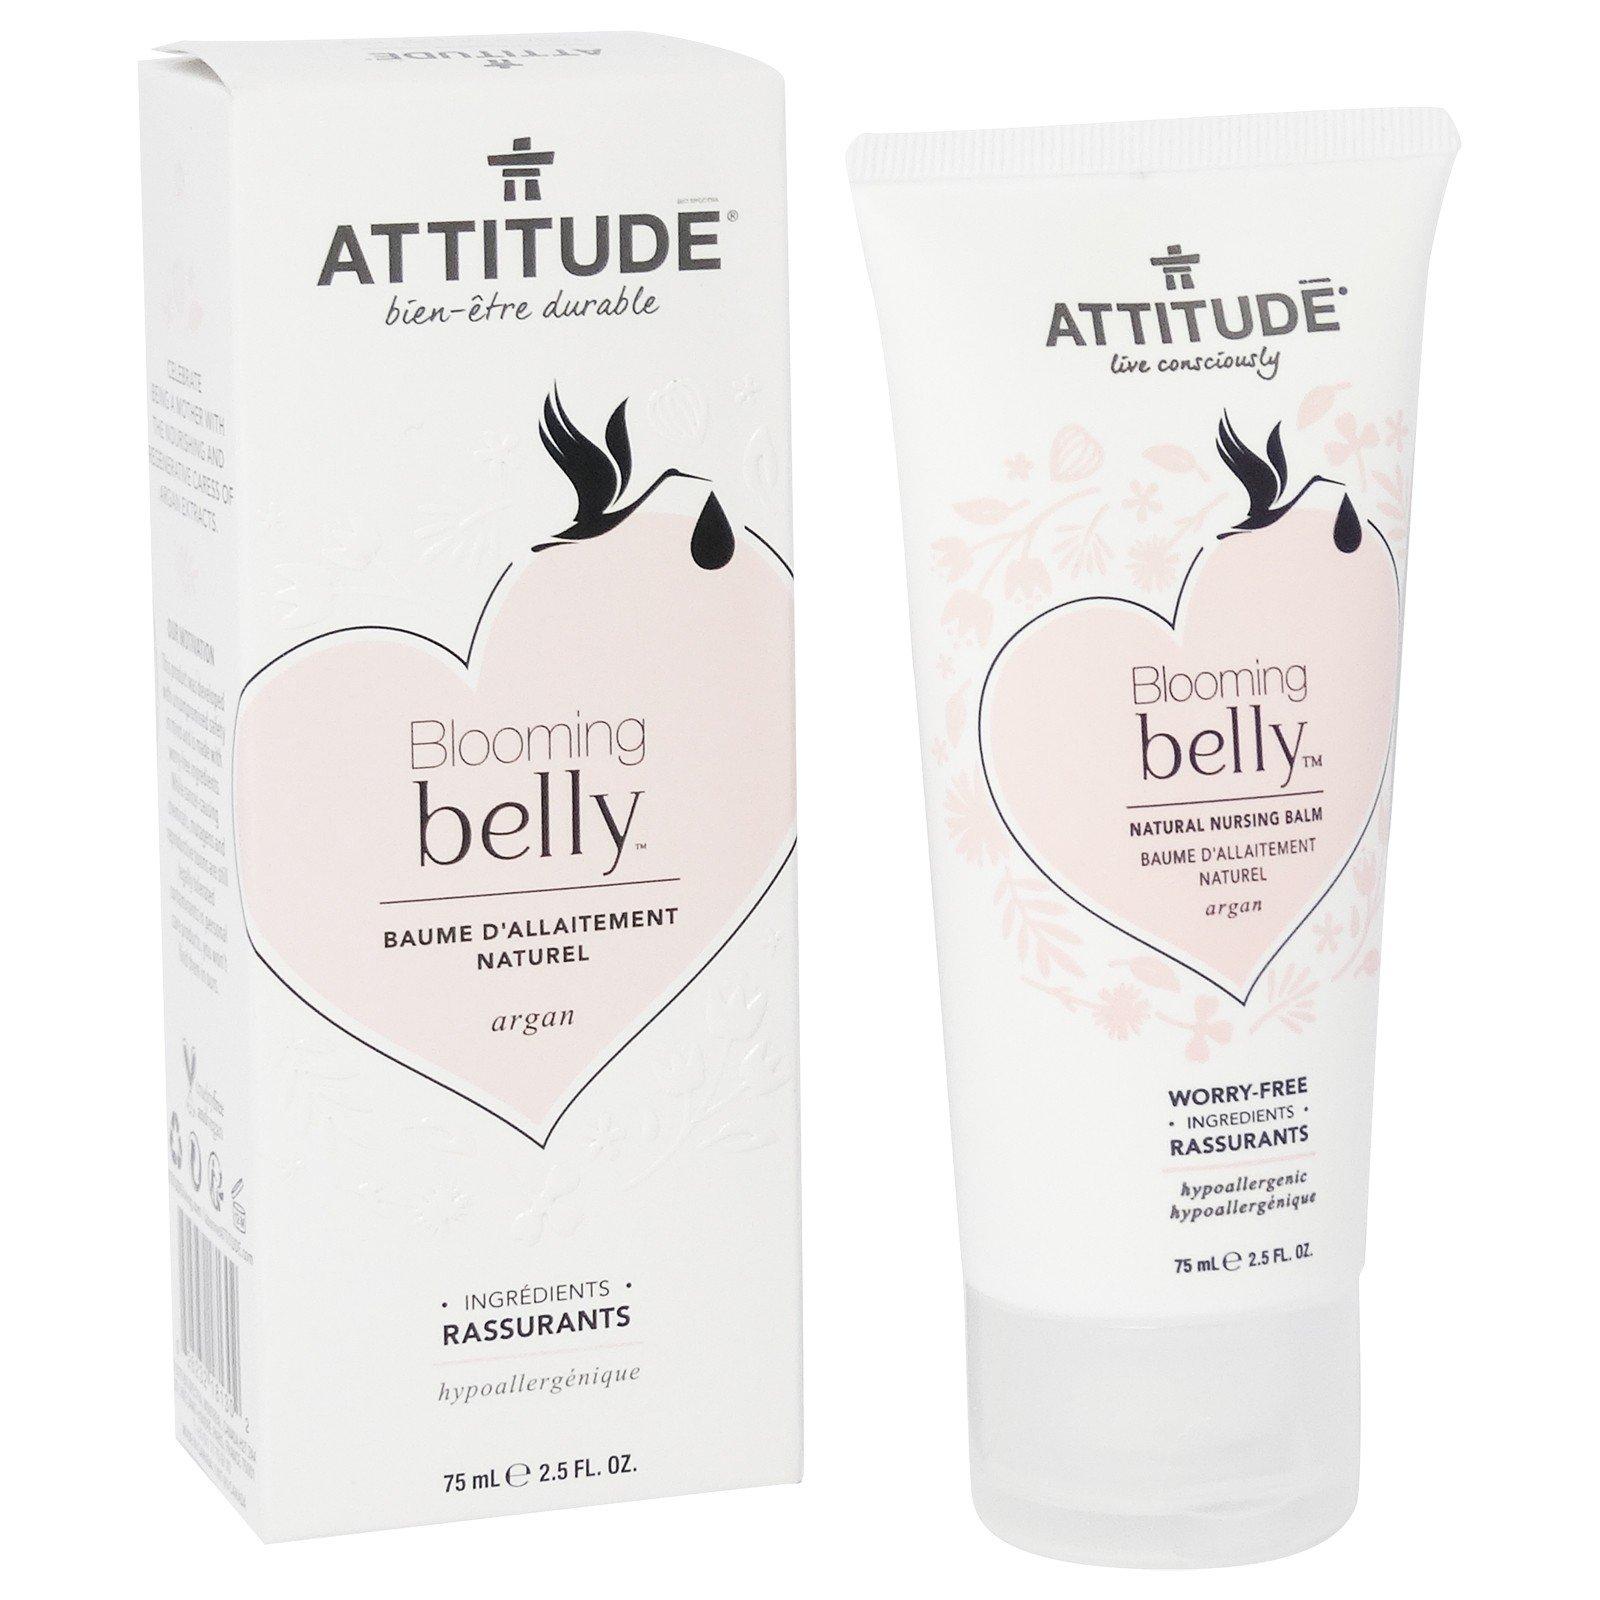 ATTITUDE - Blooming Belly - Argan Natural Nursing Balm - Dedicated to Future Moms - No Harmful Ingredients - Hypoallergenic - EWG and Ecologo Certificates - Vegan & Cruelty Free - 75 ml